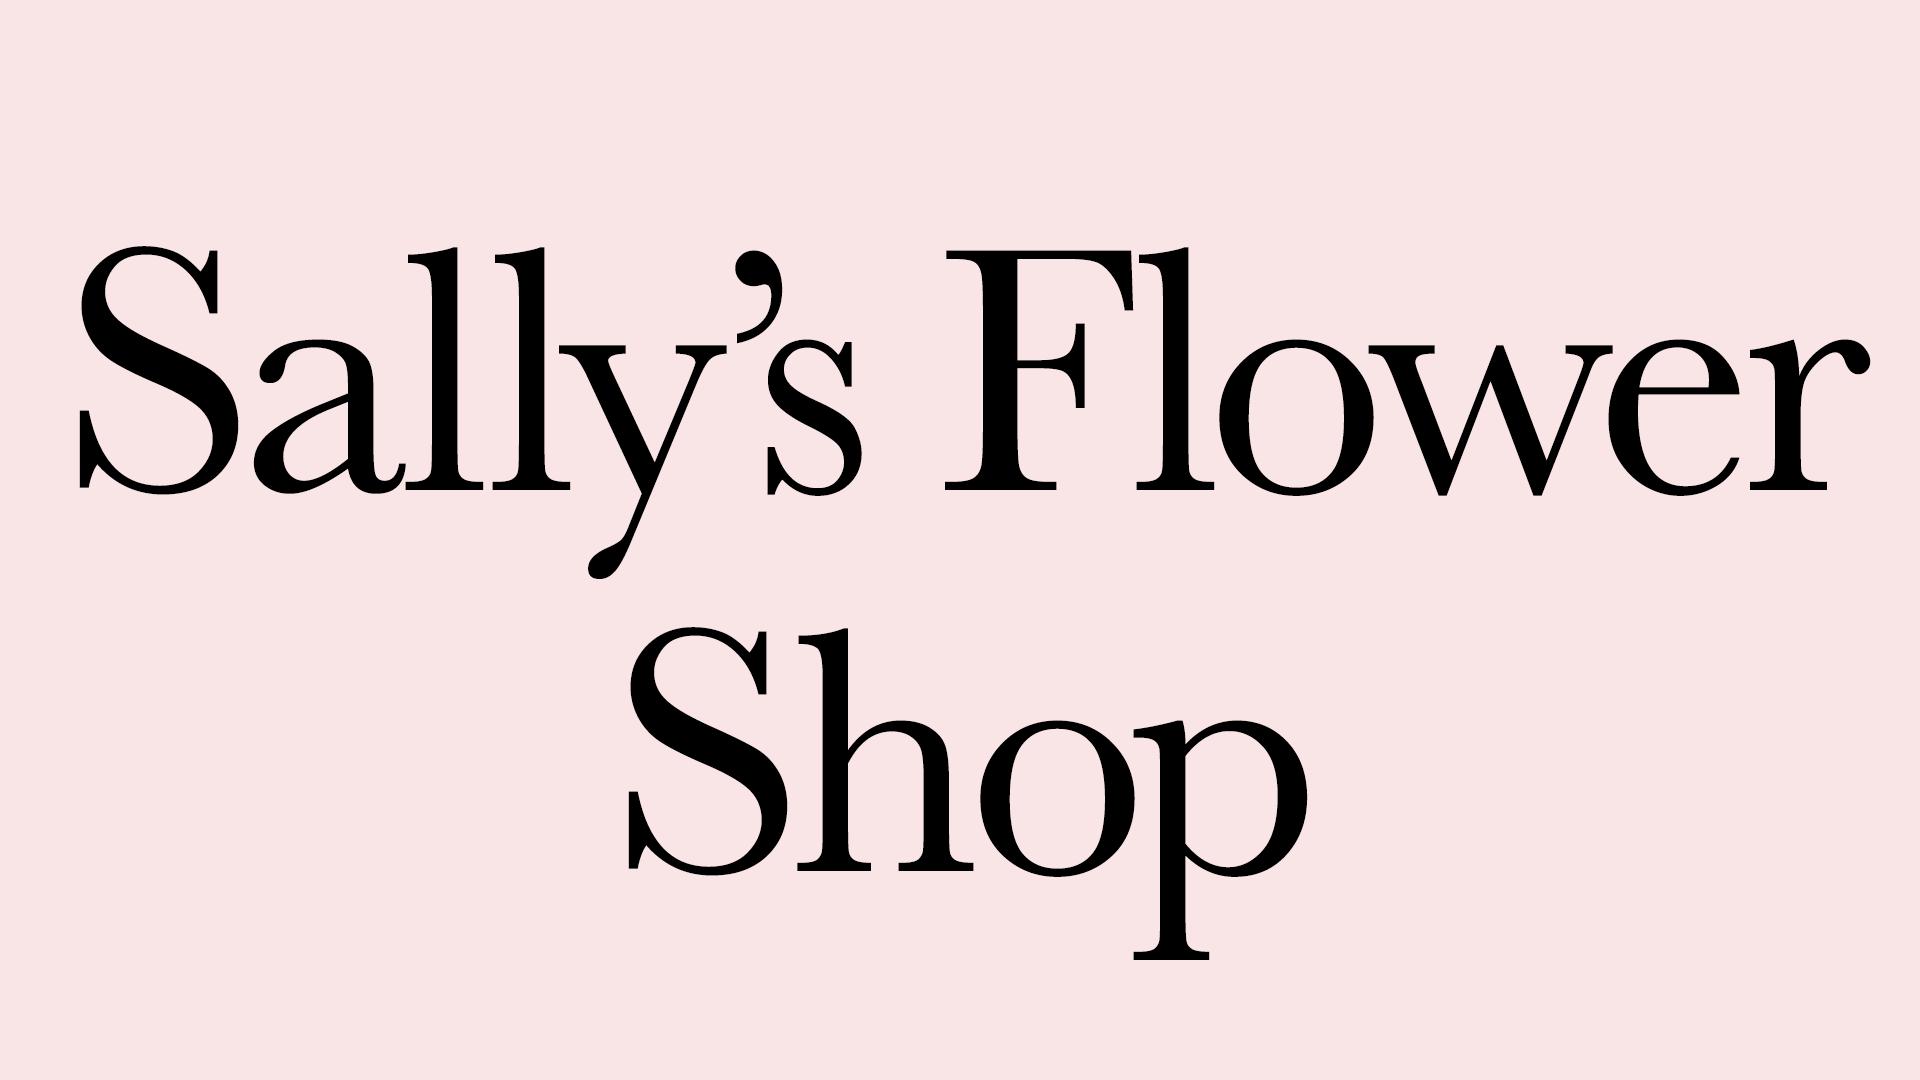 Sally's Flower Shop